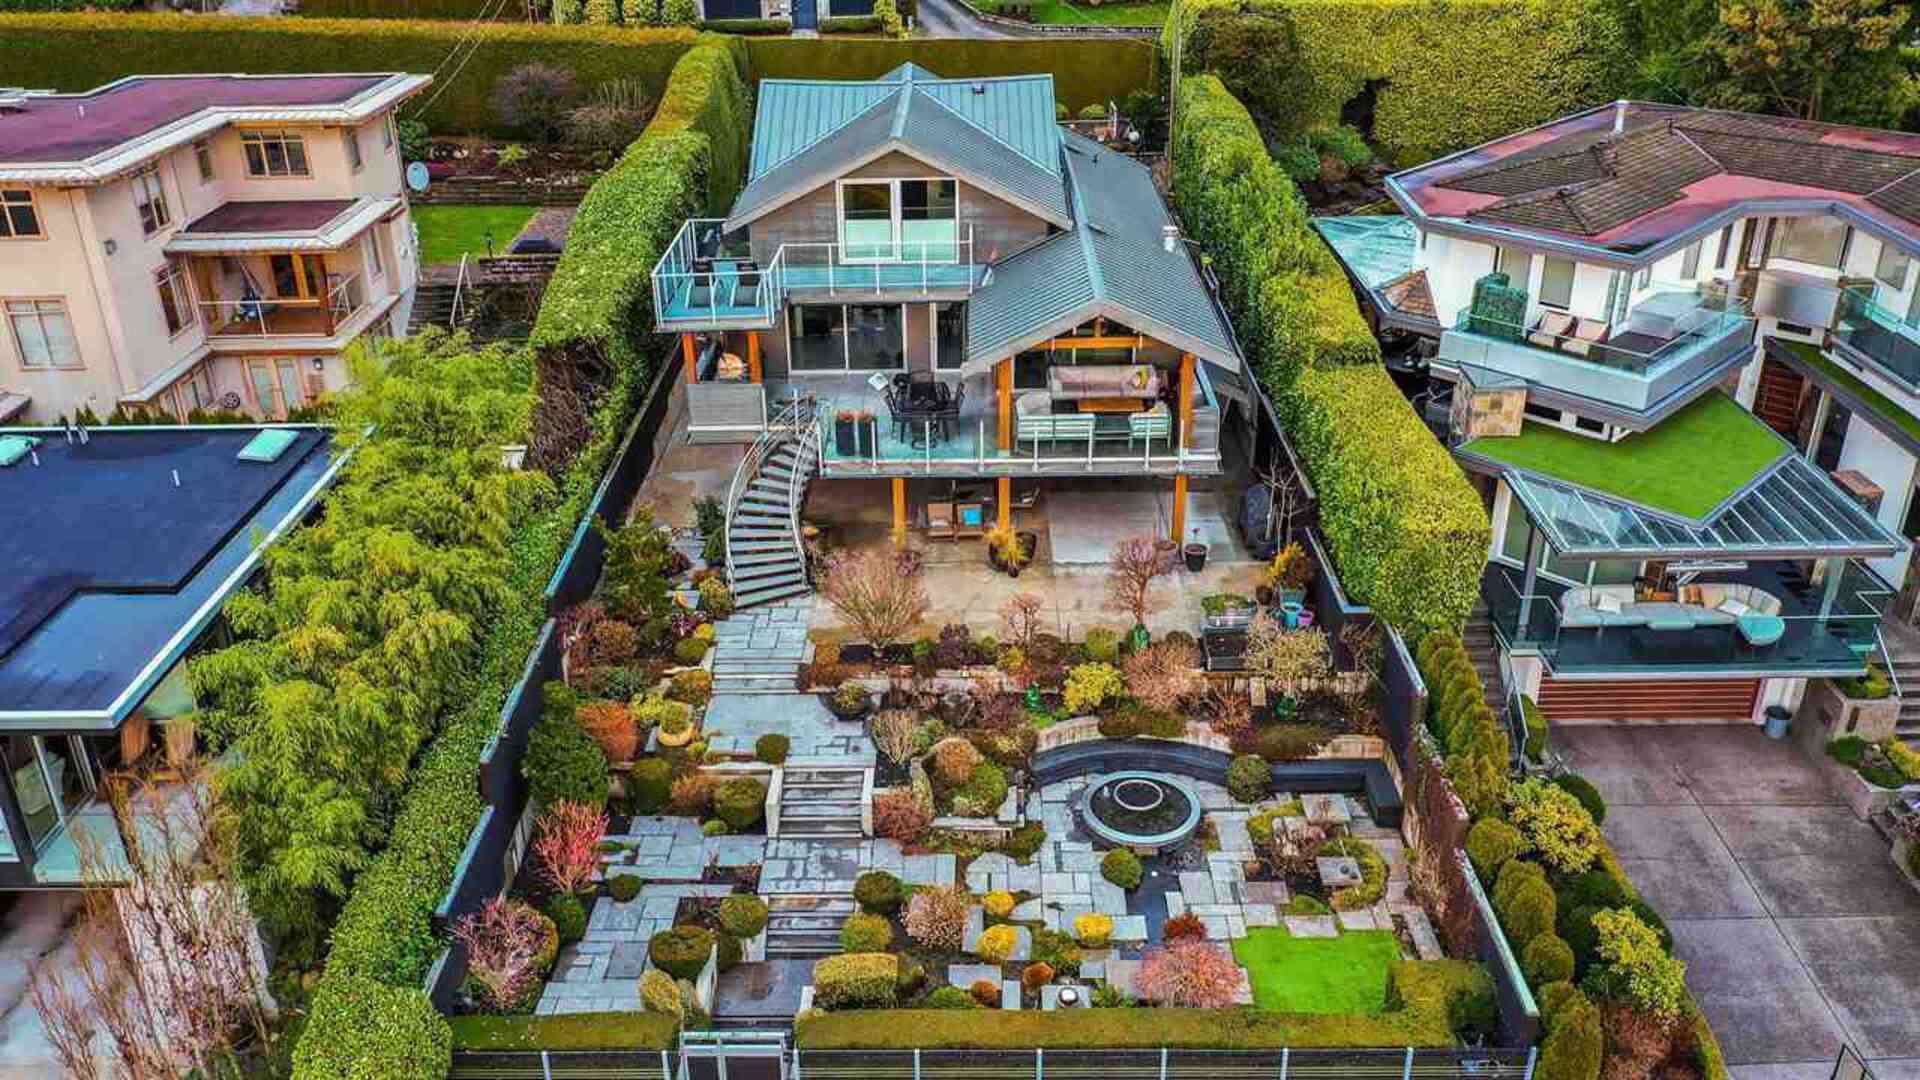 2771-bellevue-avenue-dundarave-west-vancouver-02 at 2771 Bellevue Avenue, Dundarave, West Vancouver